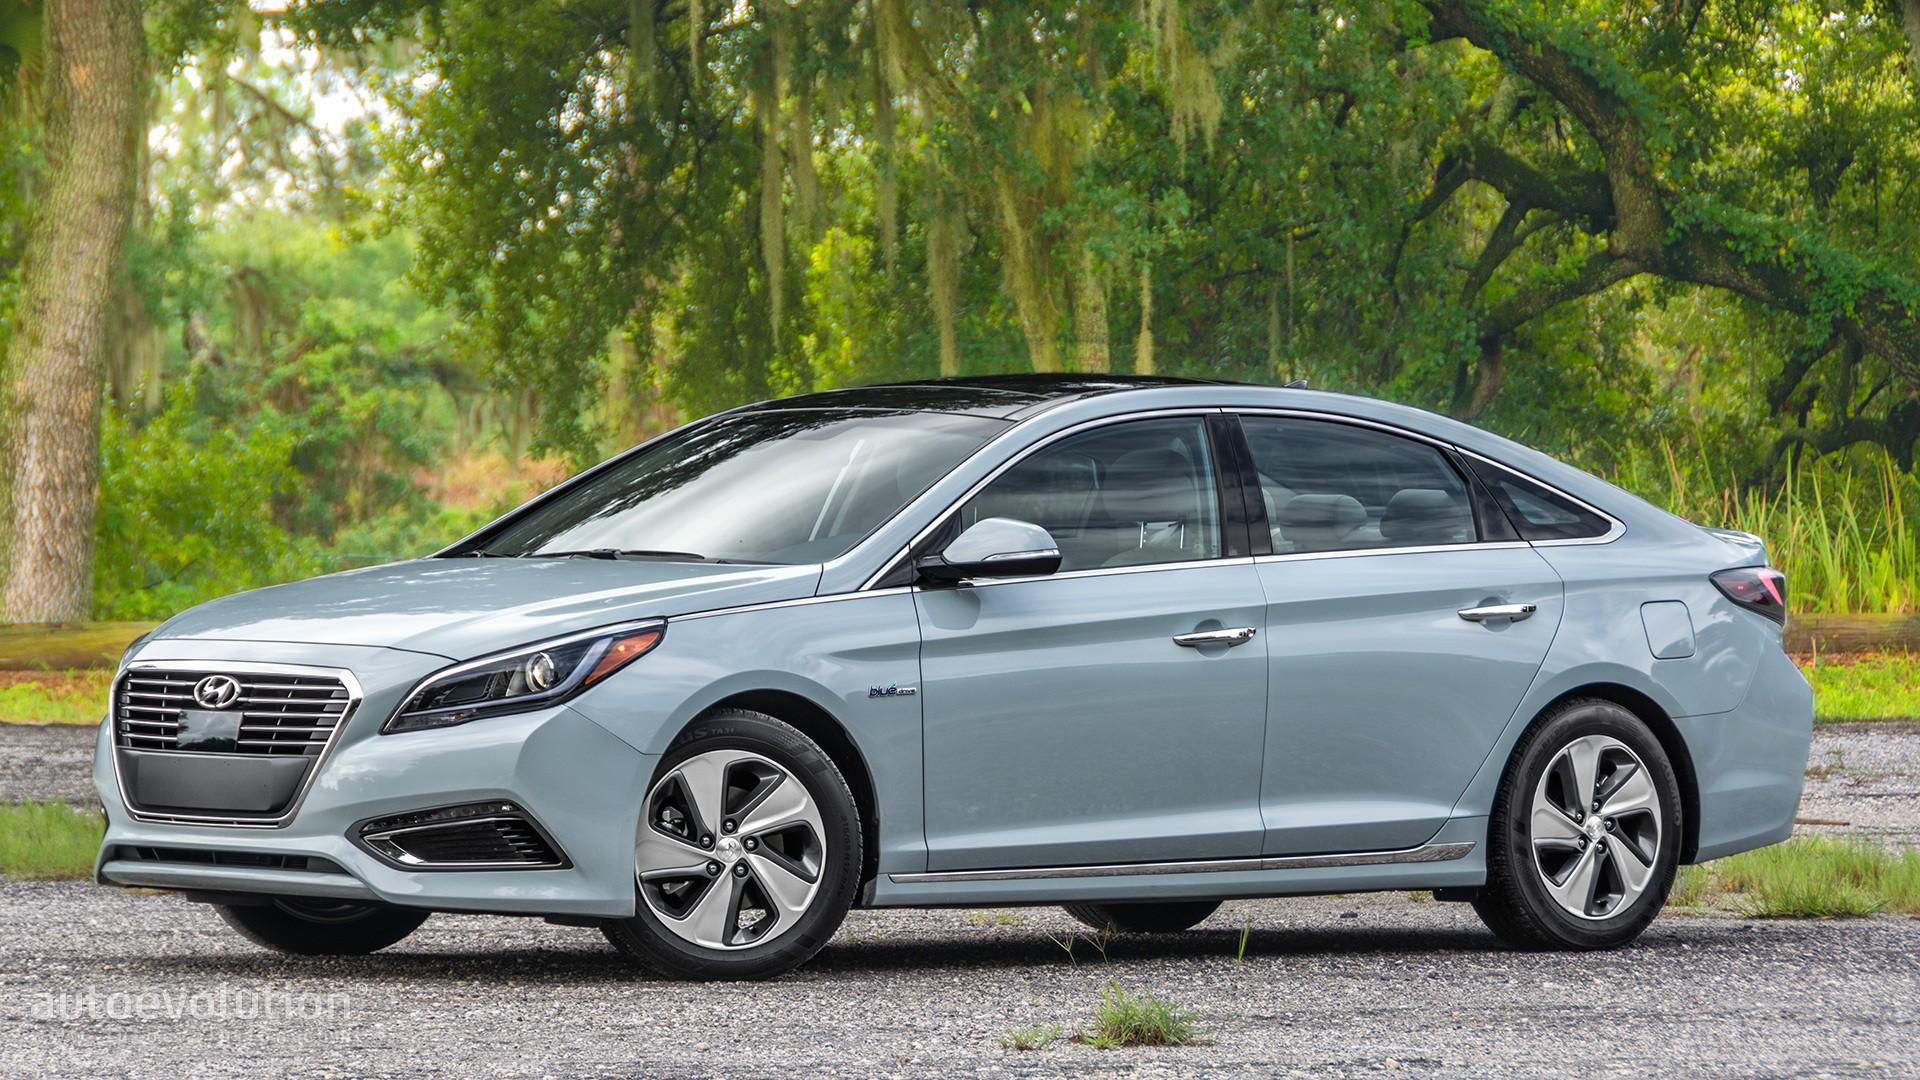 2017 Hyundai Sonata Hybrid >> 2016 HYUNDAI SONATA HYBRID Review - autoevolution